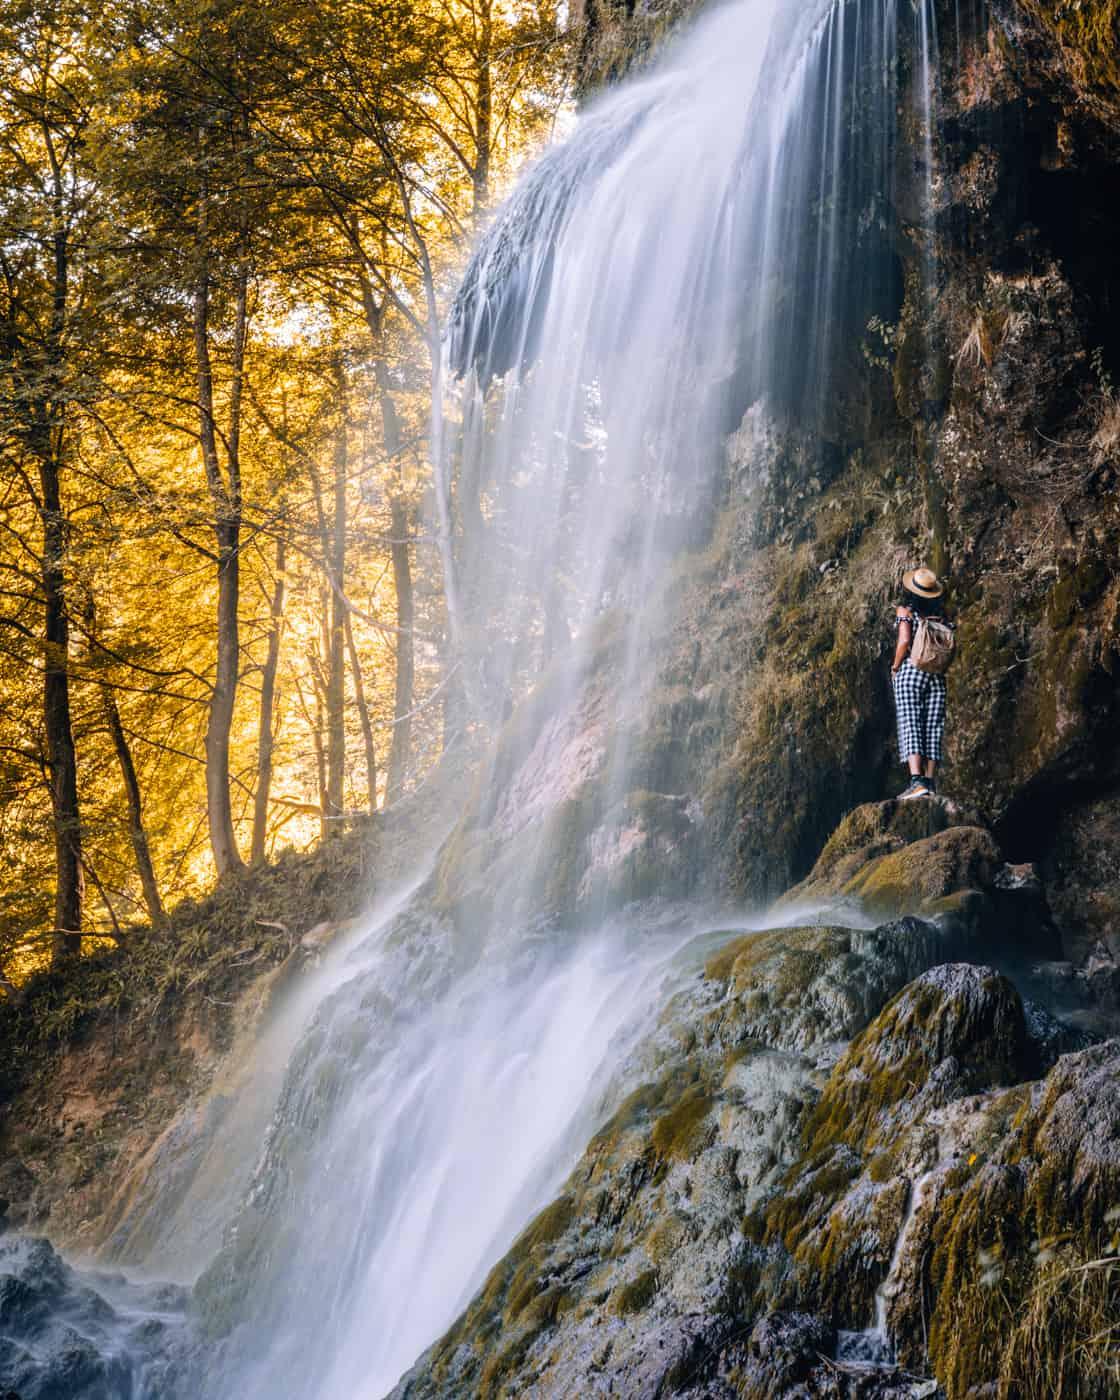 Ausflugsziele Stuttgart: #2 - Wasserfallsteig Bad Urach